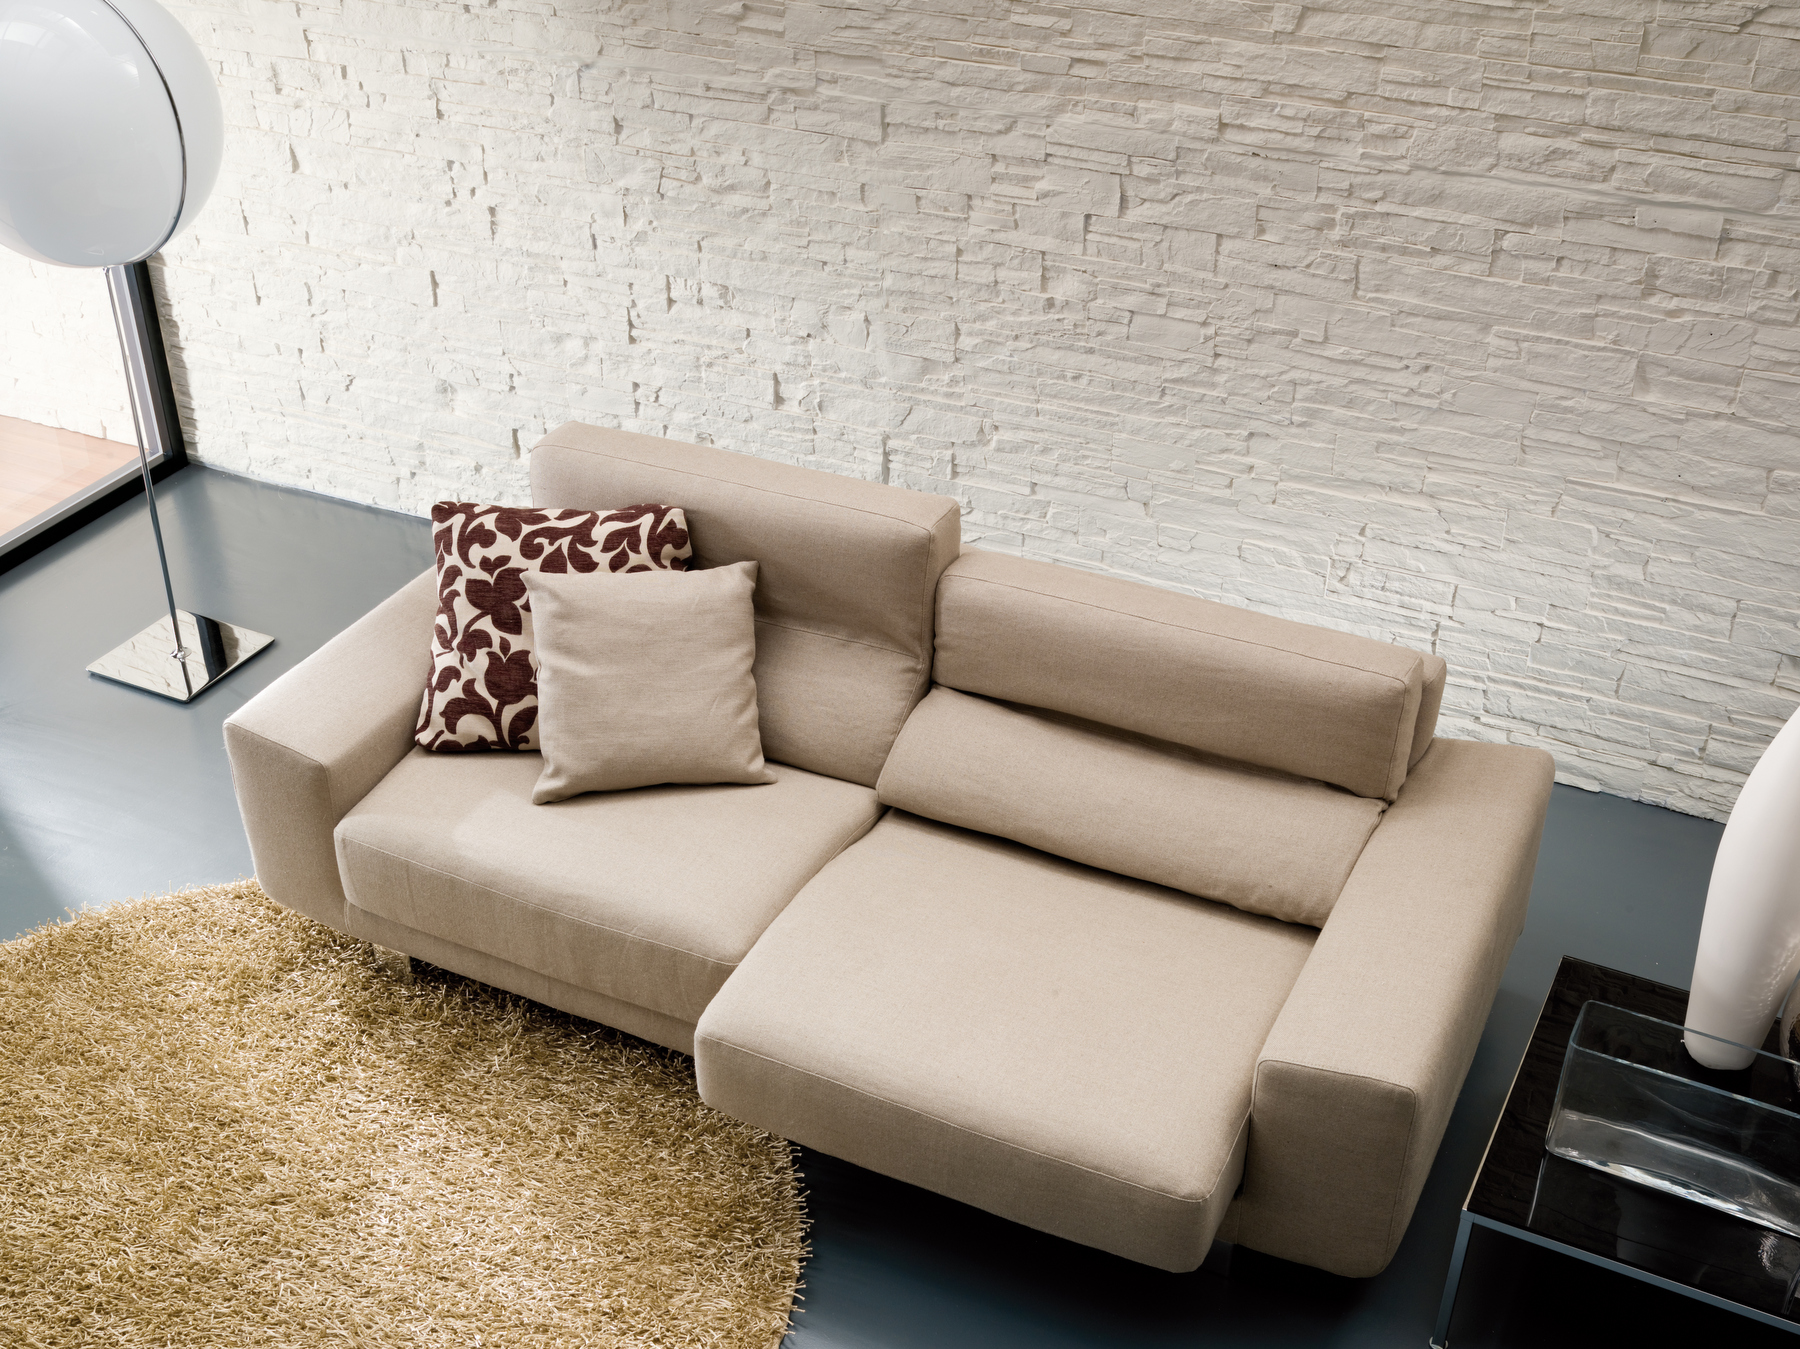 Divano imbottito a 2 posti klaus divano in tessuto - Klaus divani e divani ...